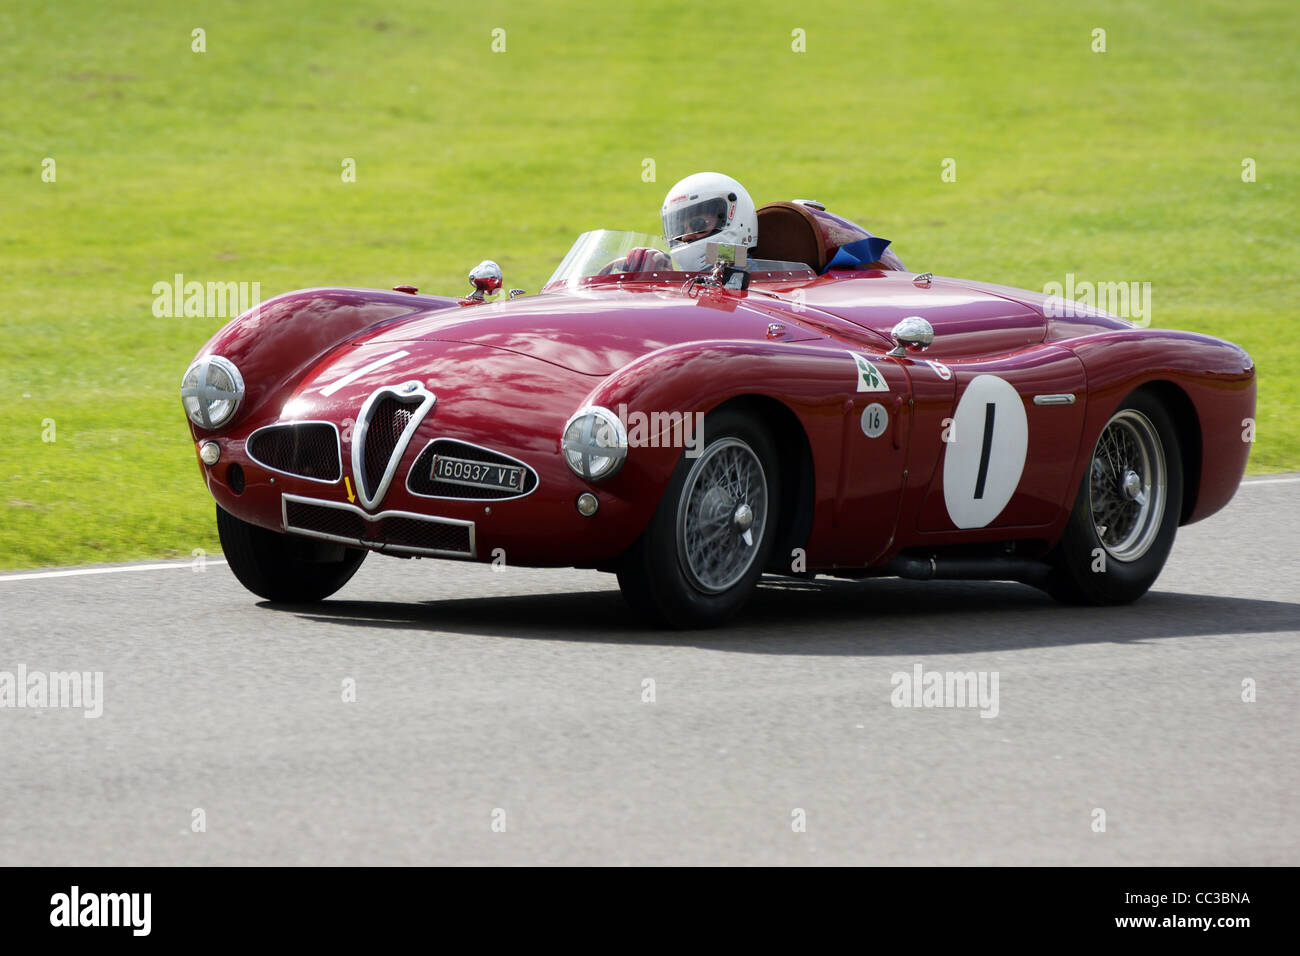 Alfa Romeo Stockbild